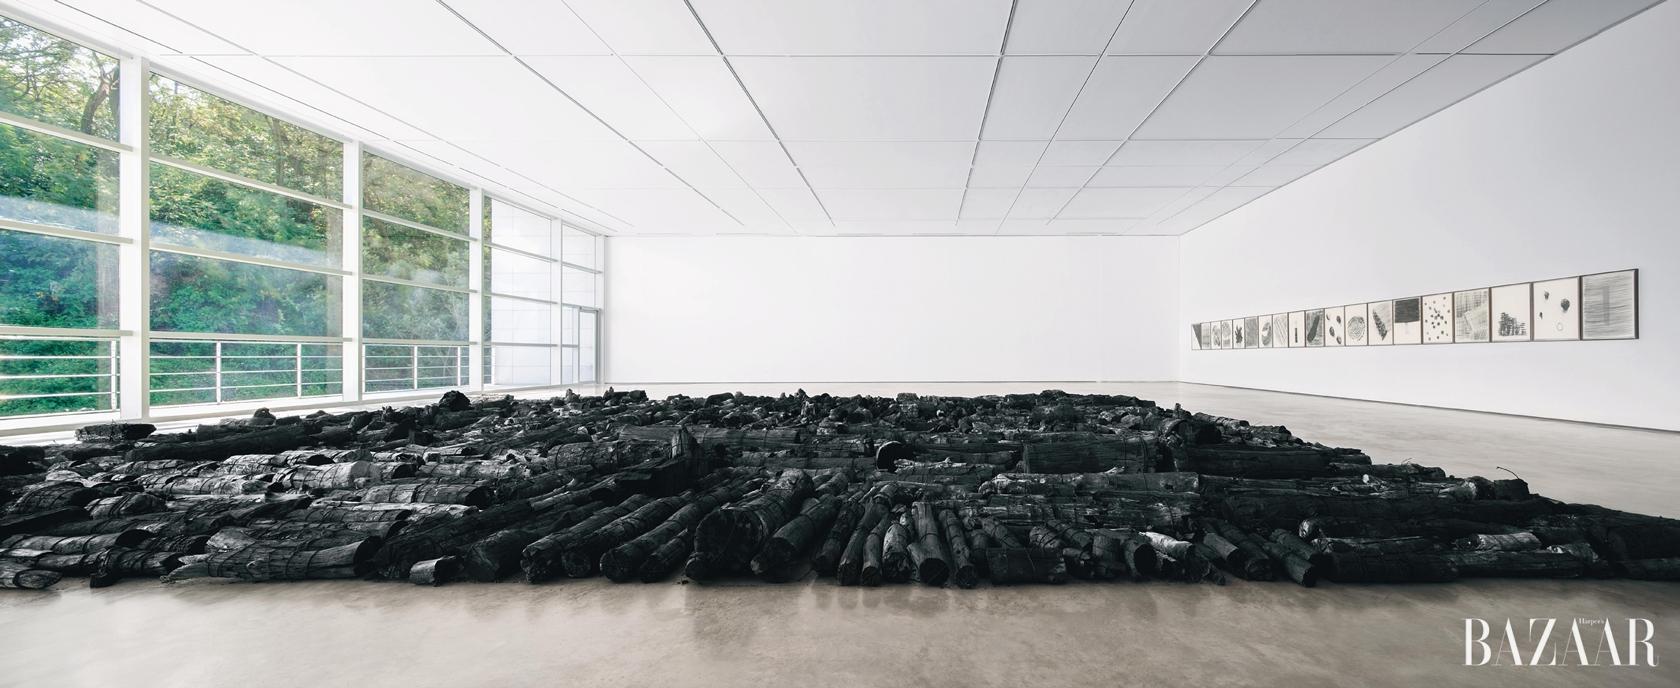 'Landscape', 불탄 목재, 18×16m, 대구 미술관 전시 전경, 2014